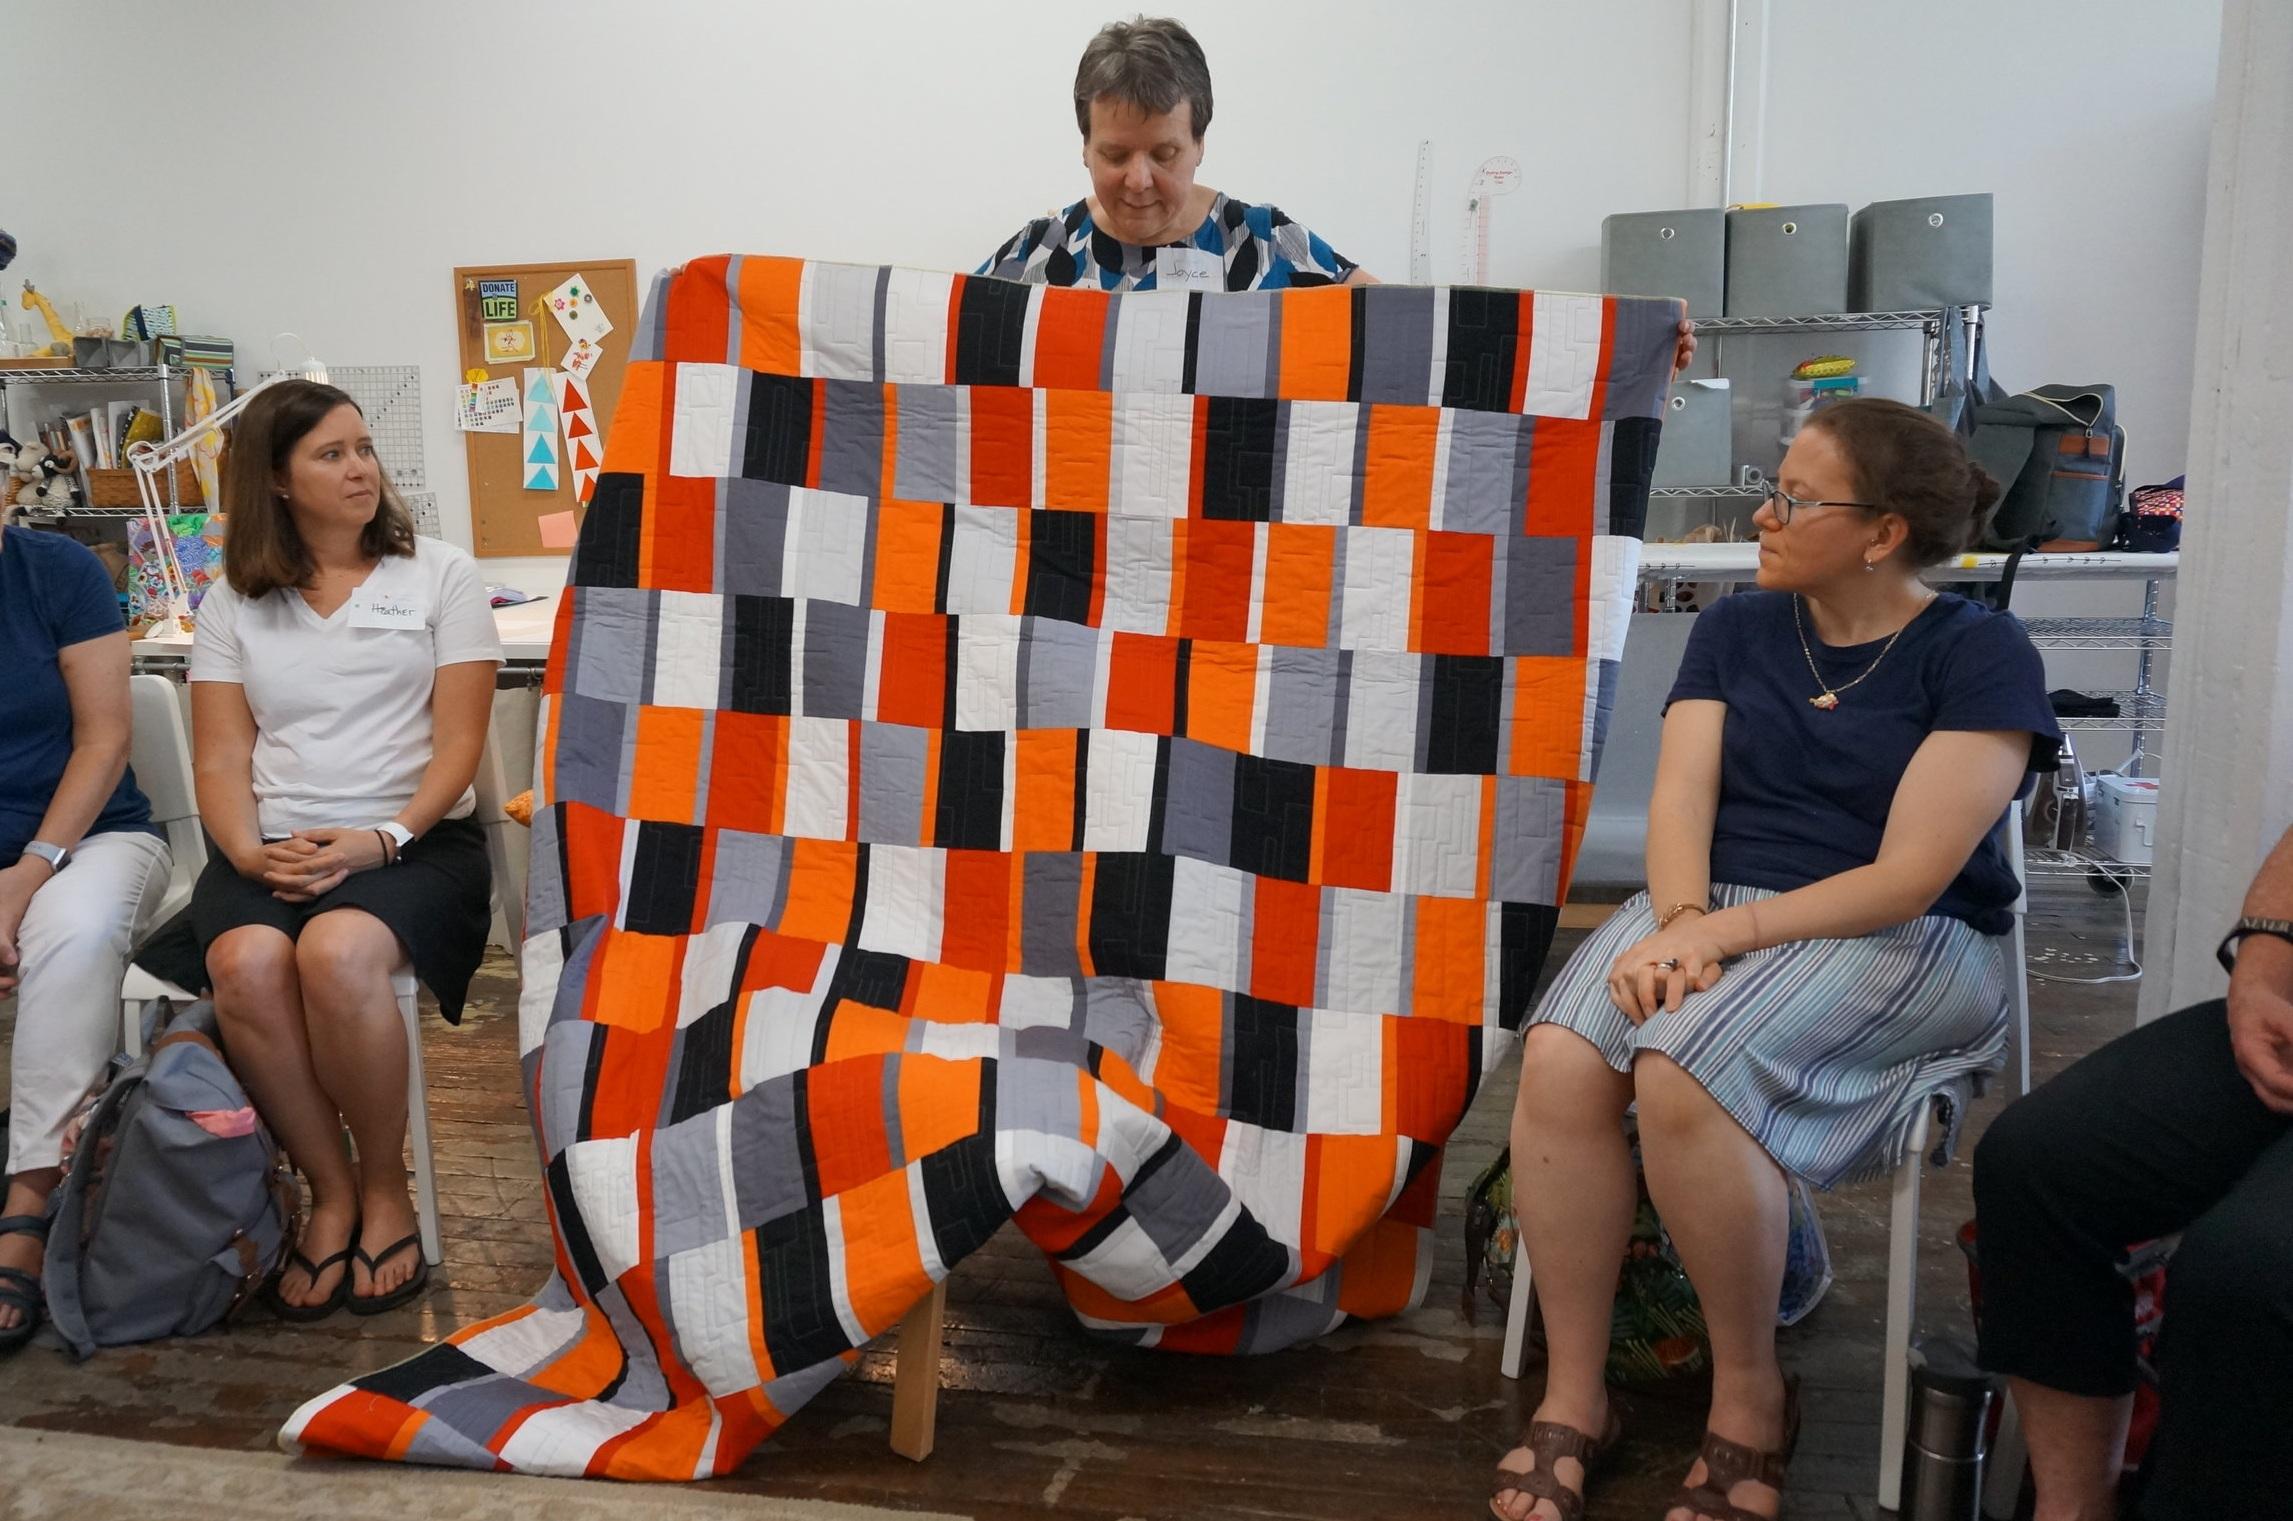 Joyce's son's quilt